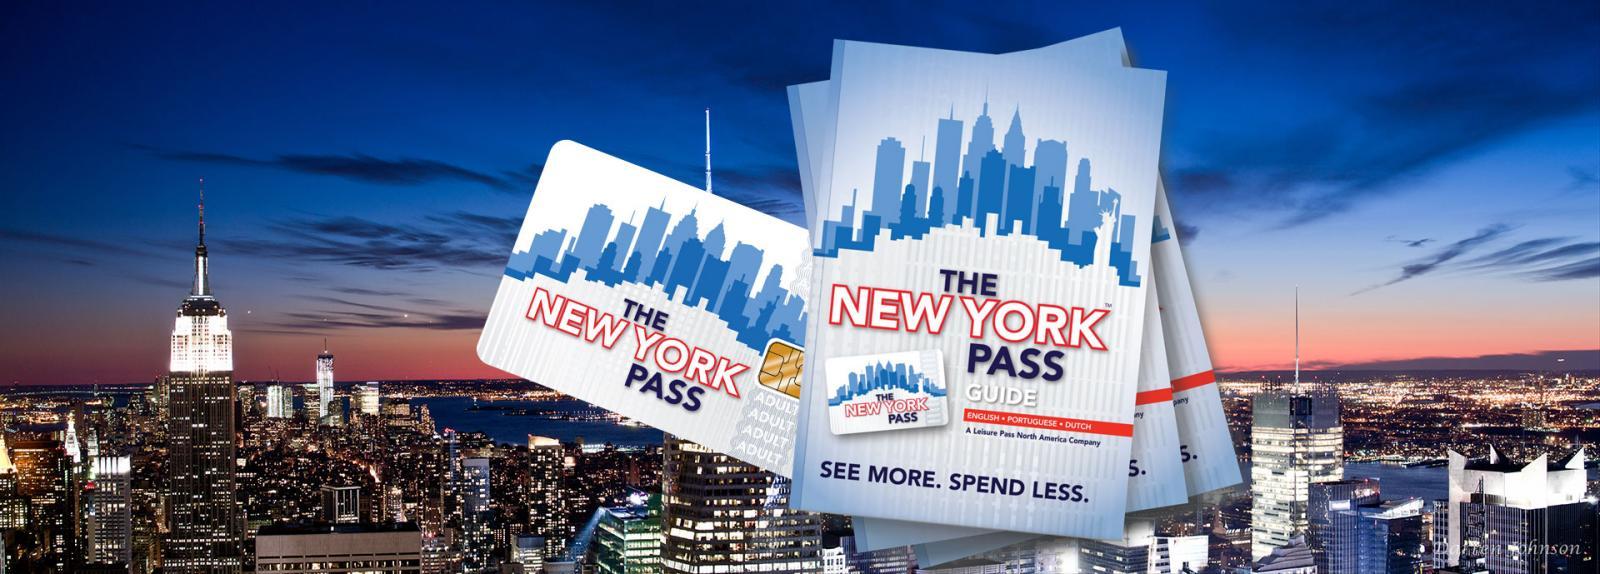 new york pass nova york loving new york. Black Bedroom Furniture Sets. Home Design Ideas